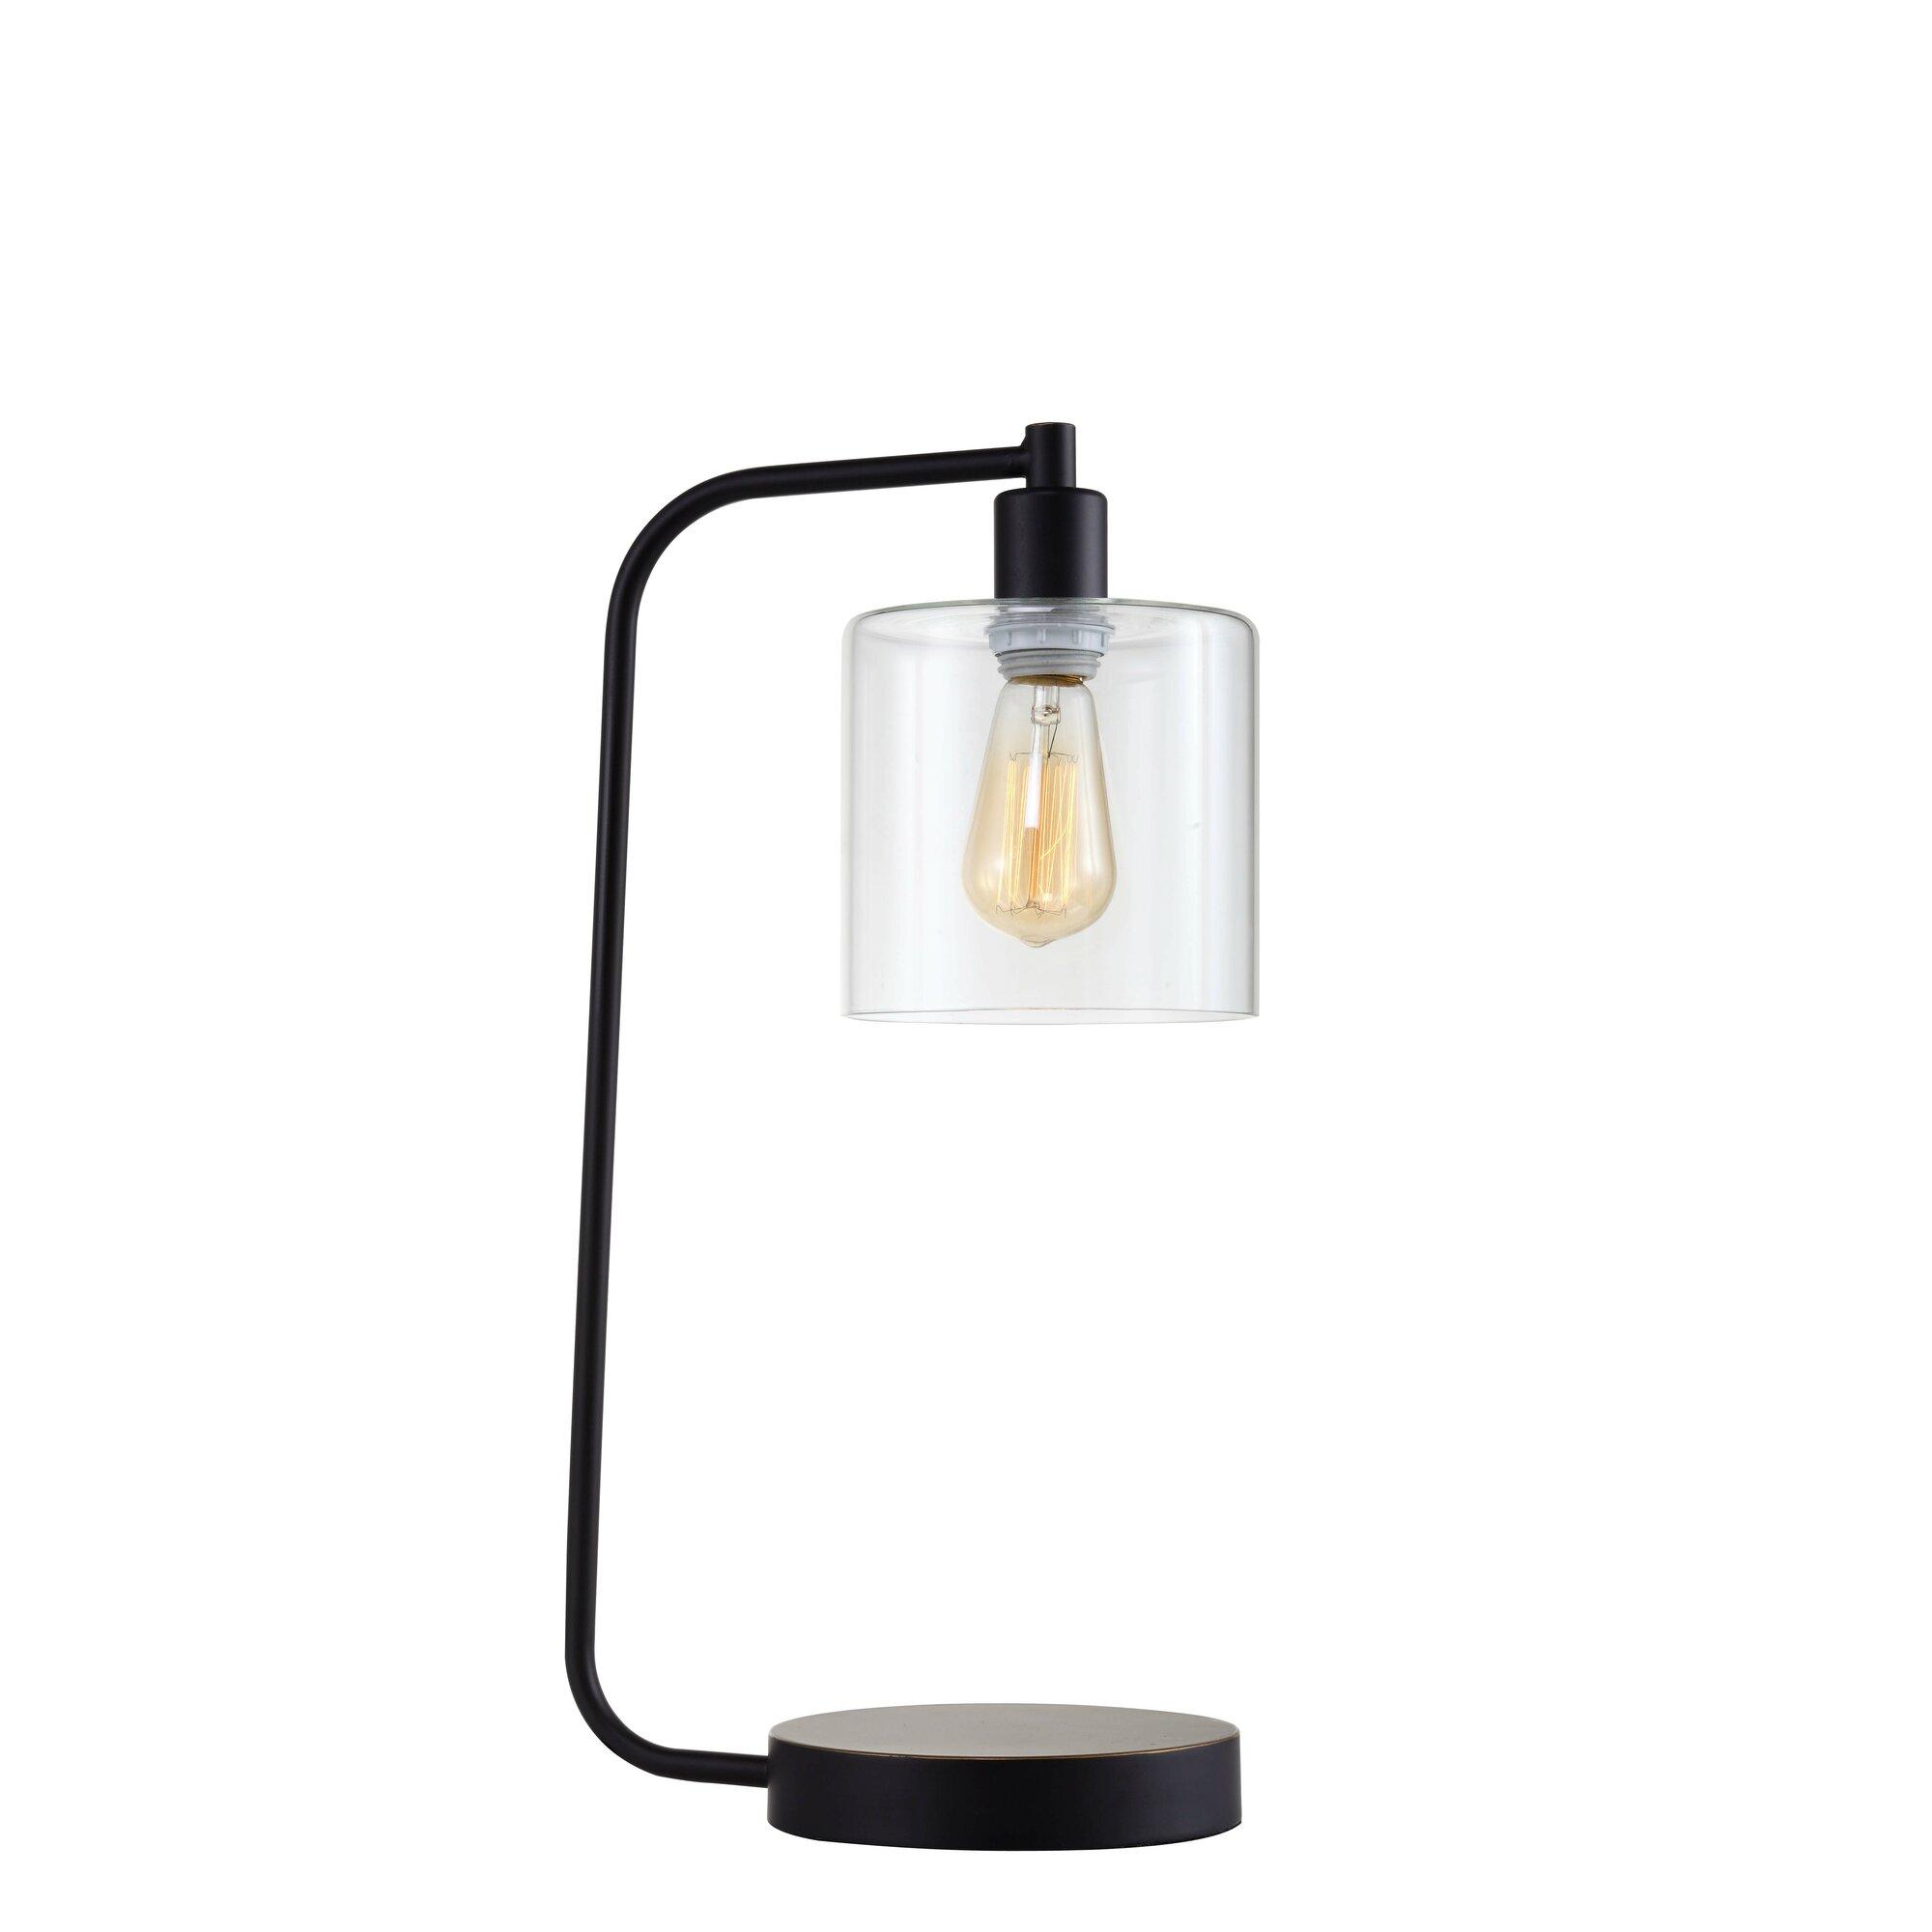 Major q industrial lantern 21 desk lamp for Wayfair industrial lamp